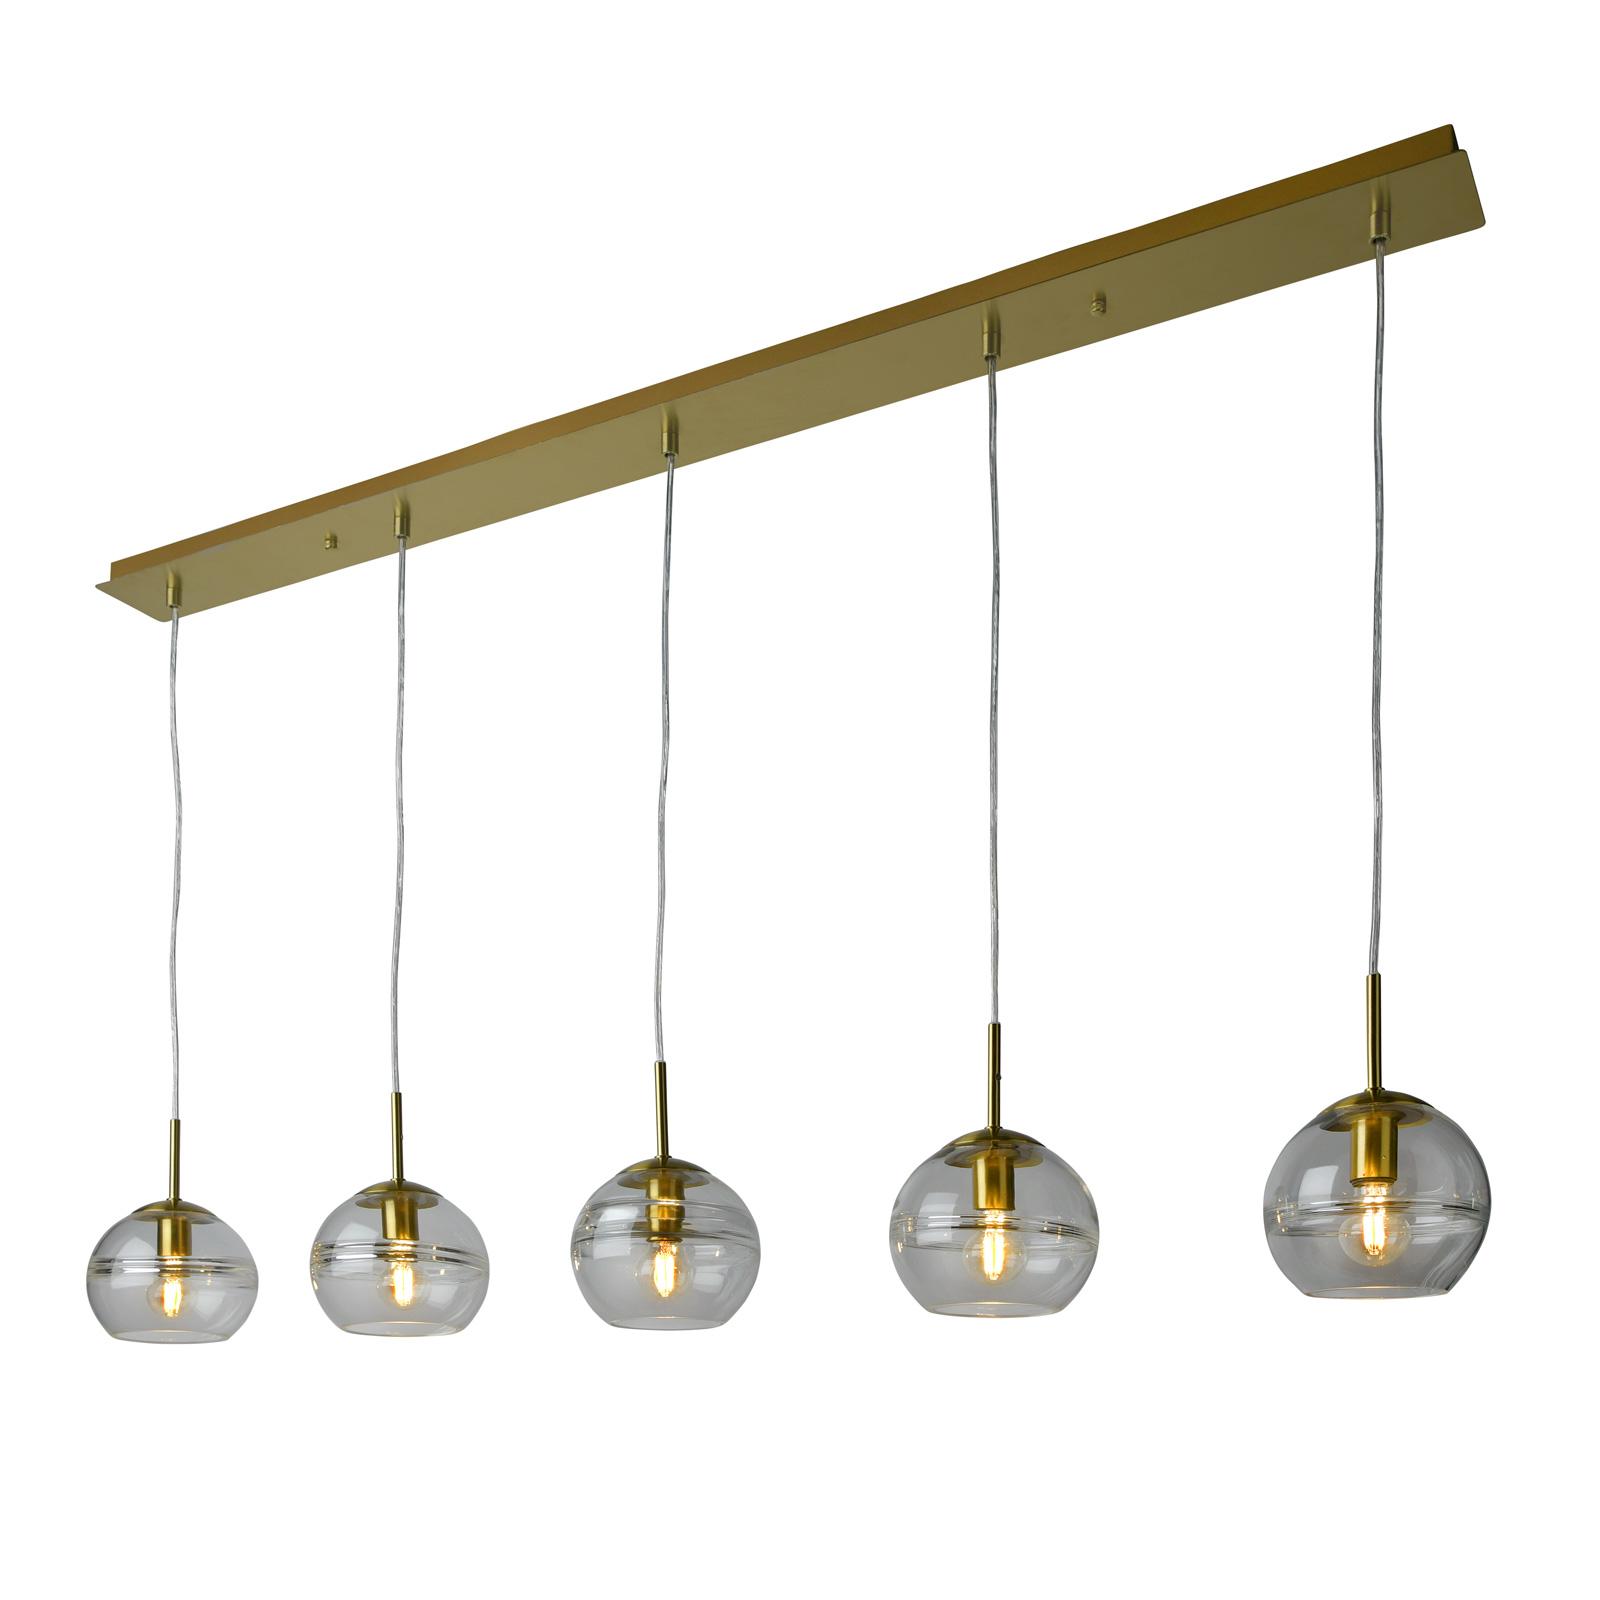 Villeroy & Boch Tokio hanglamp, goud 5-lamps